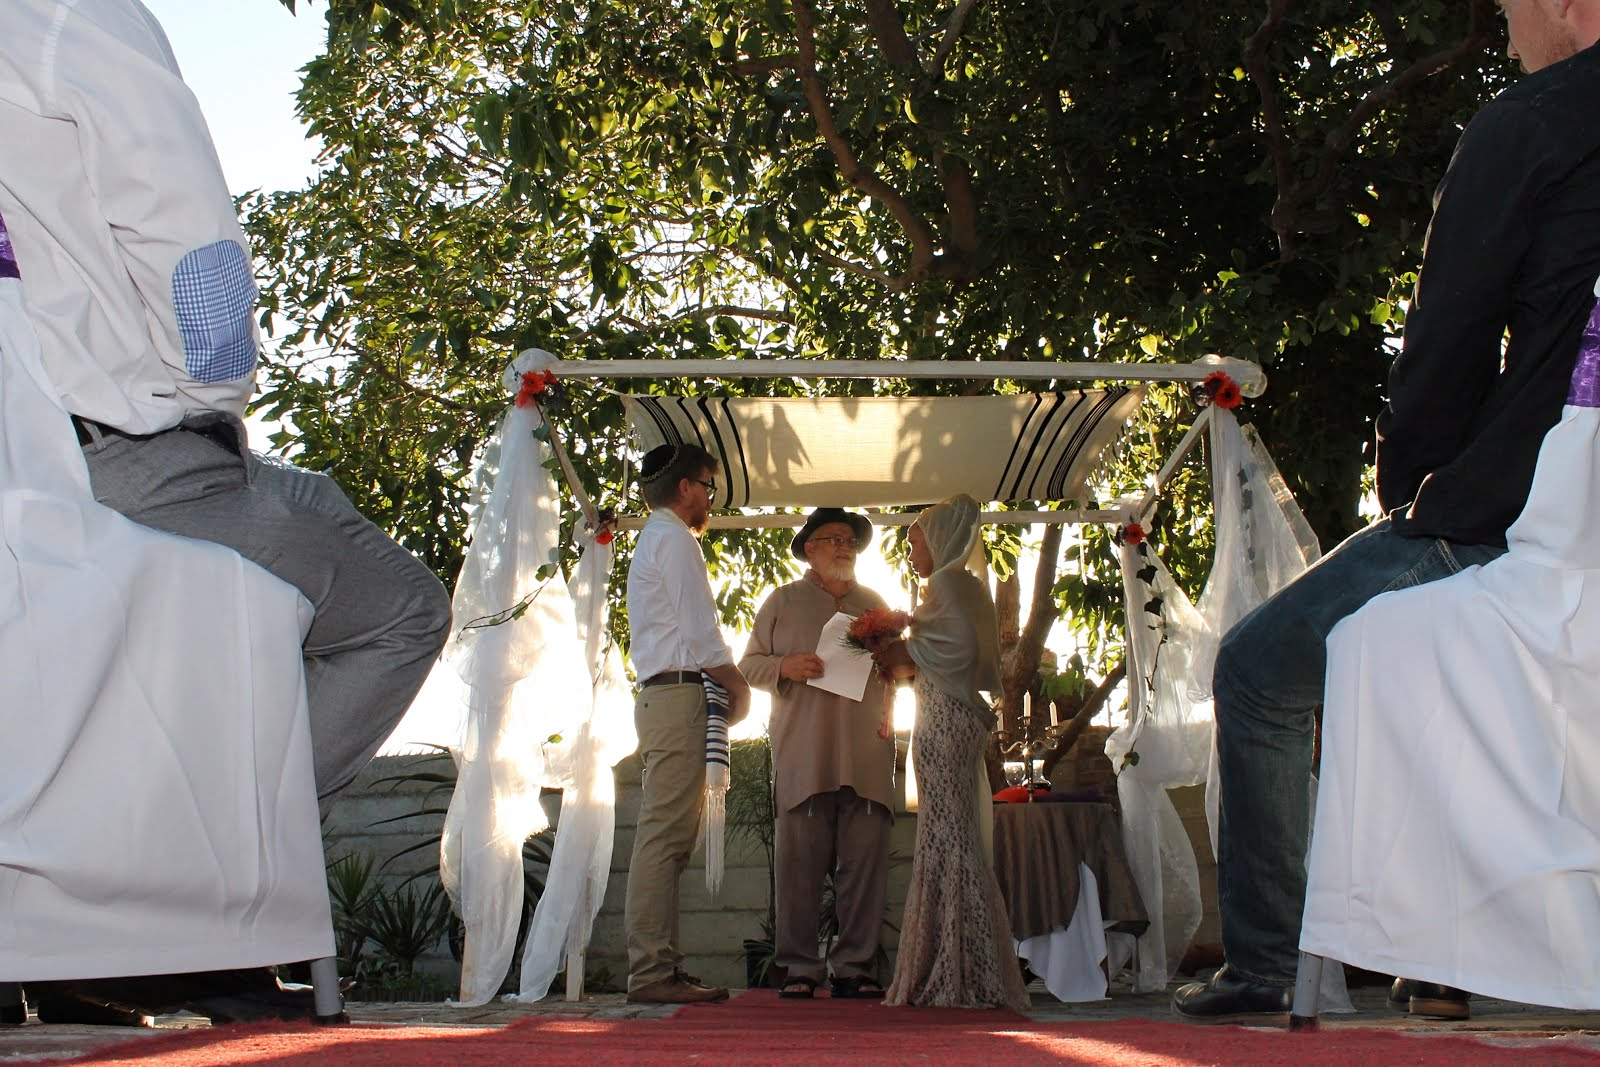 Hebraic Messianic wedding - 2017